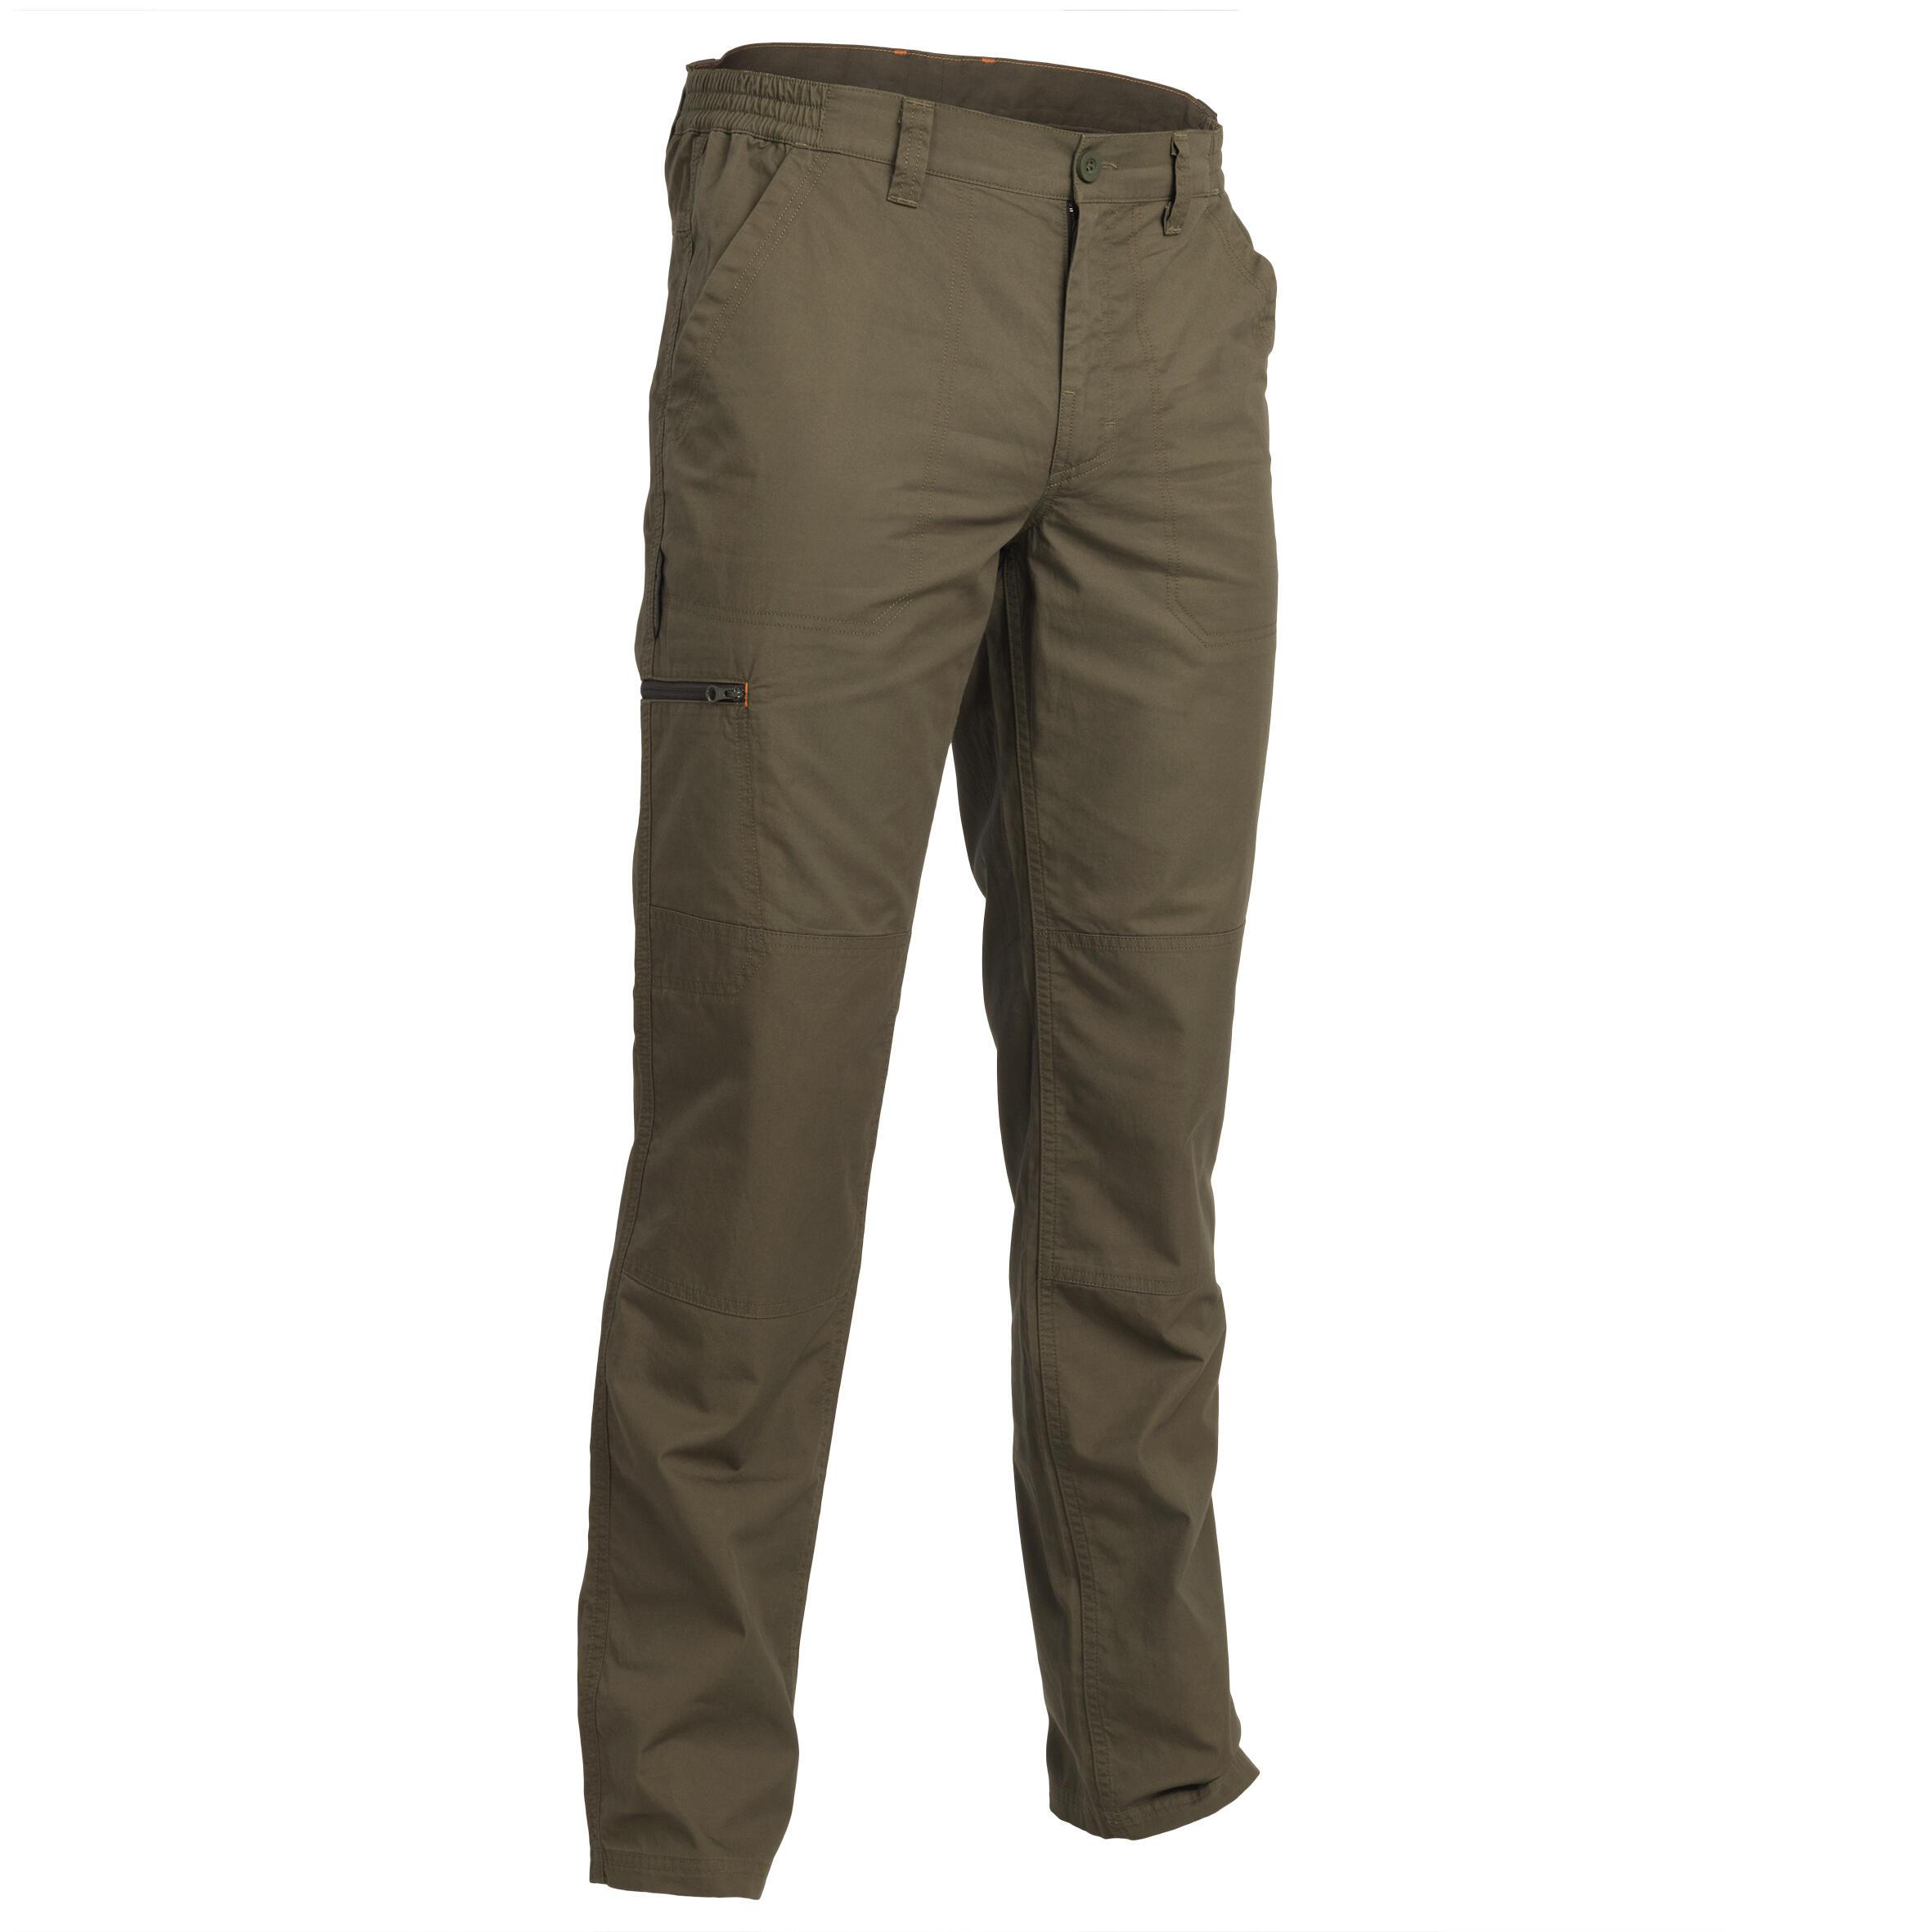 Jagdhose 100 leicht grün | Sportbekleidung > Sporthosen > Trekkinghosen | Solognac